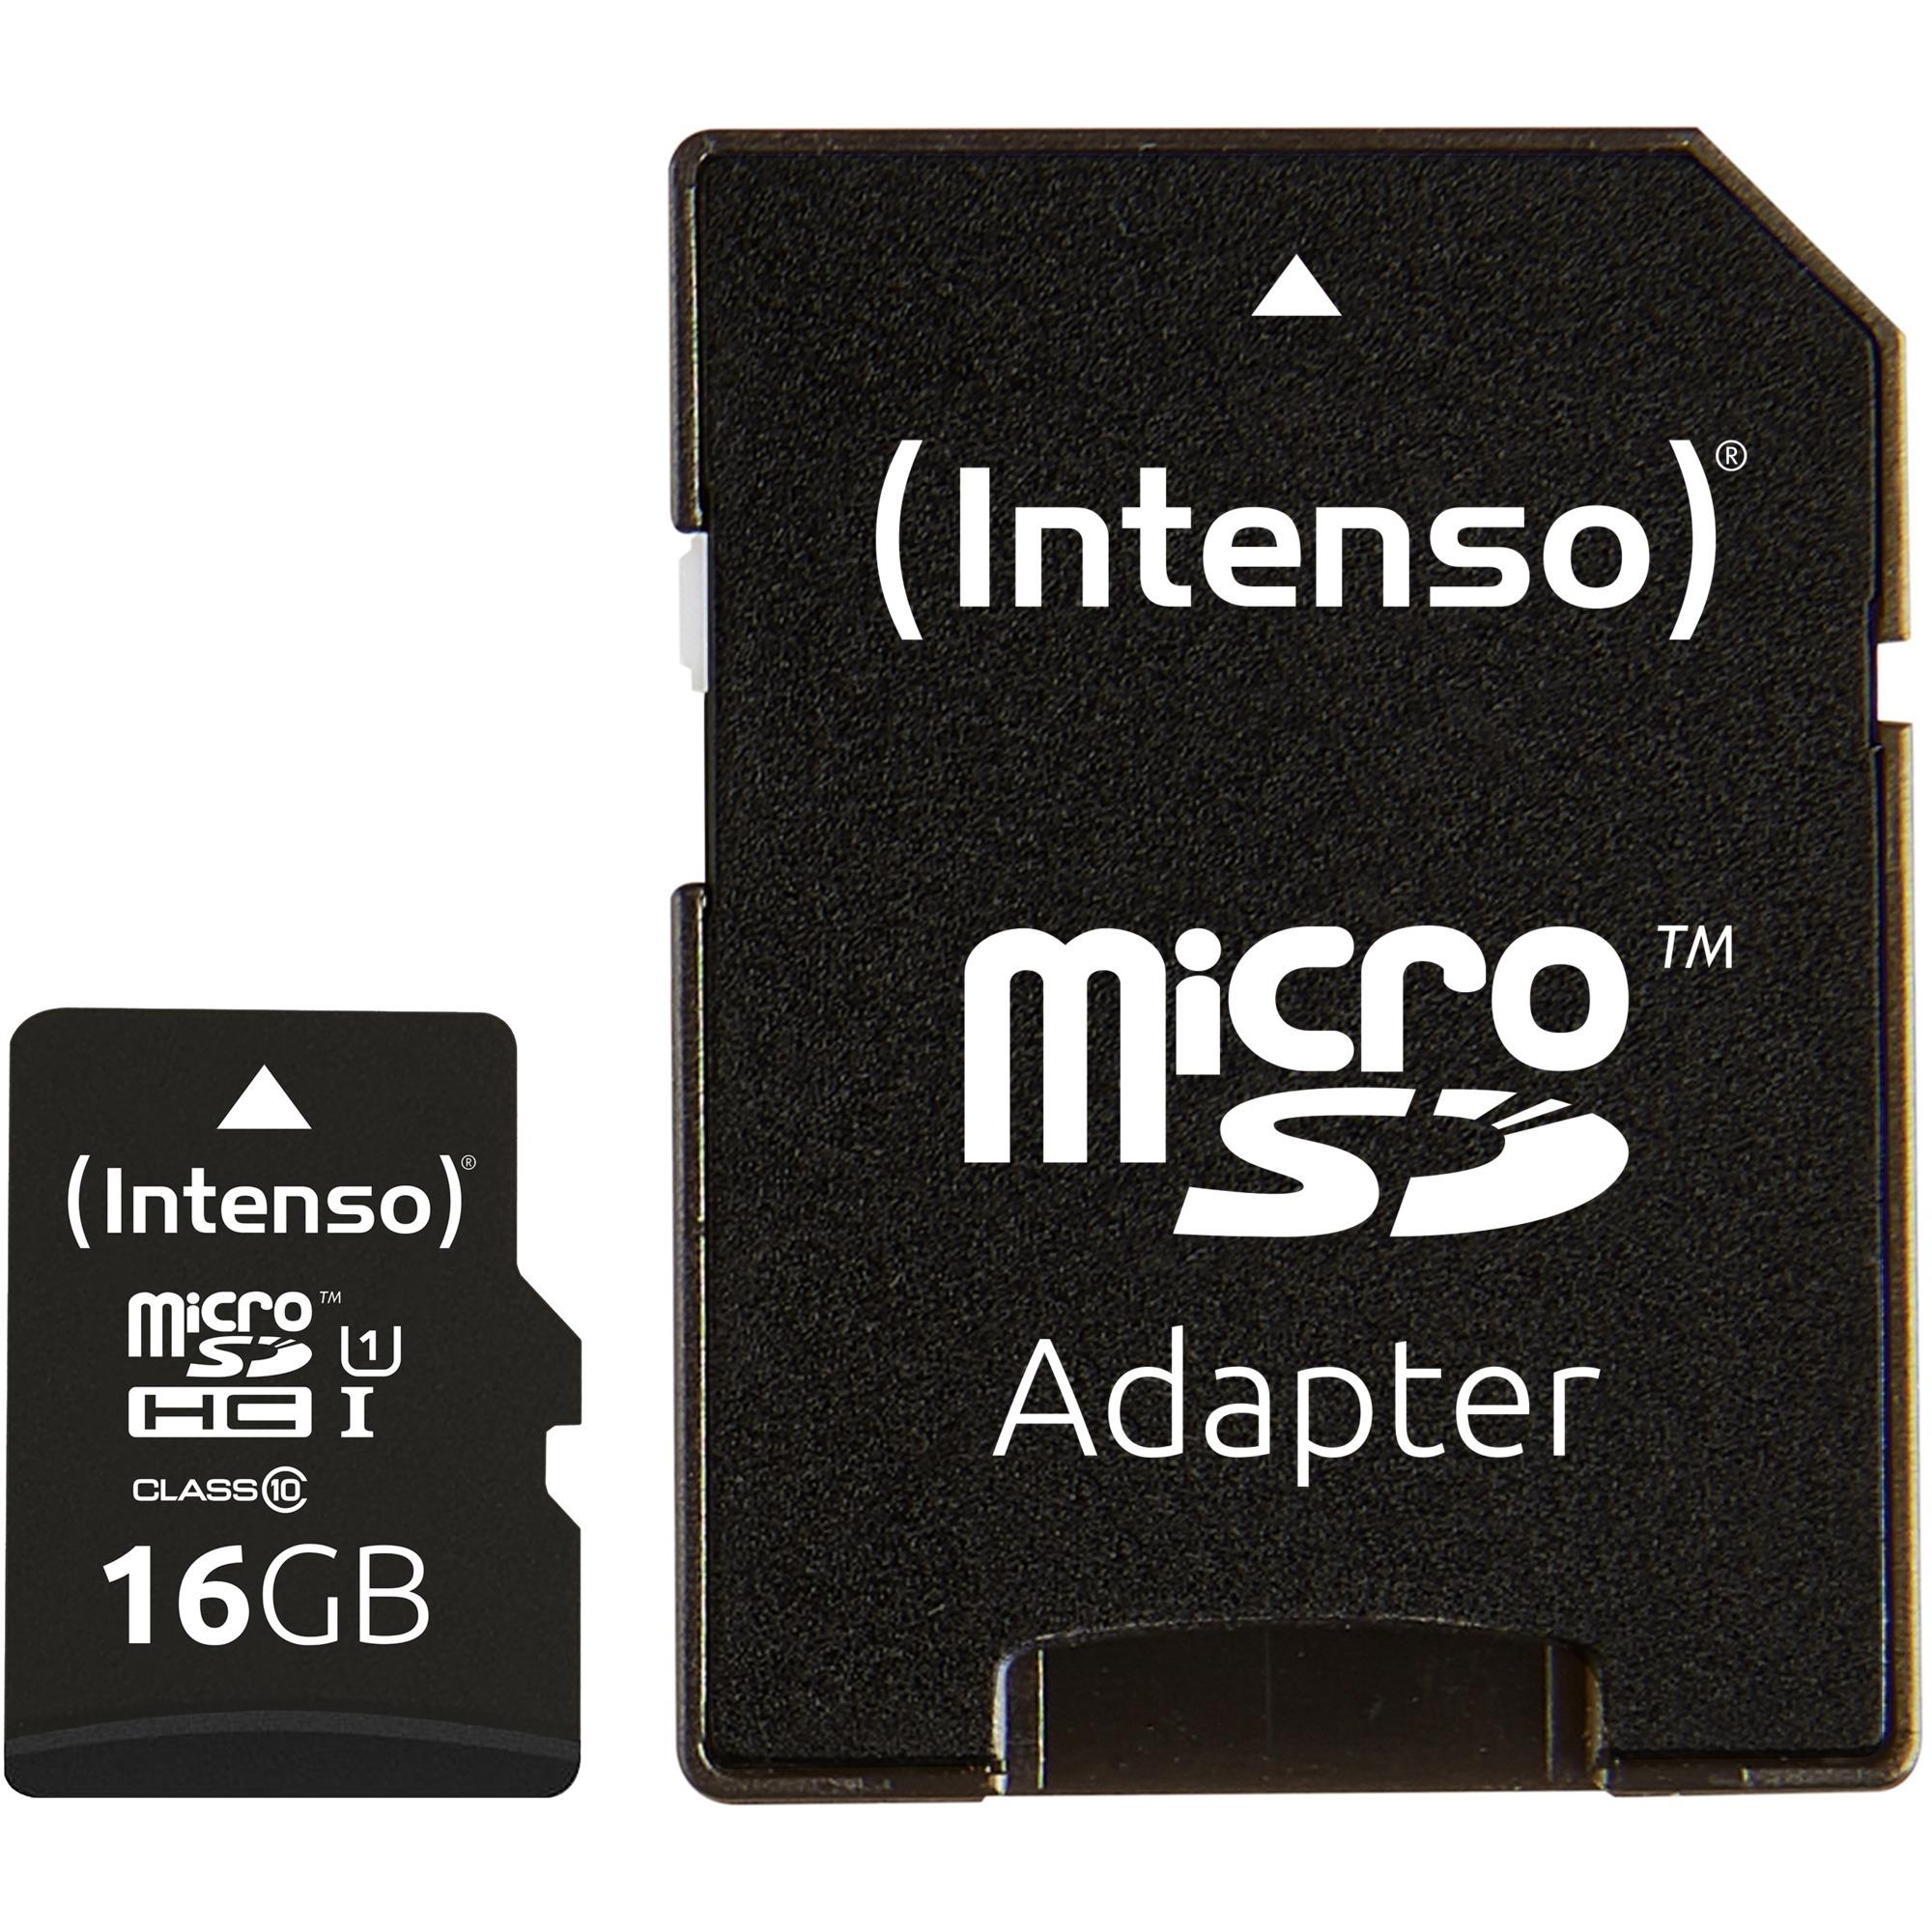 16GB microSDHC 16GB MicroSDHC UHS Clase 10 memoria flash, Tarjeta de memoria